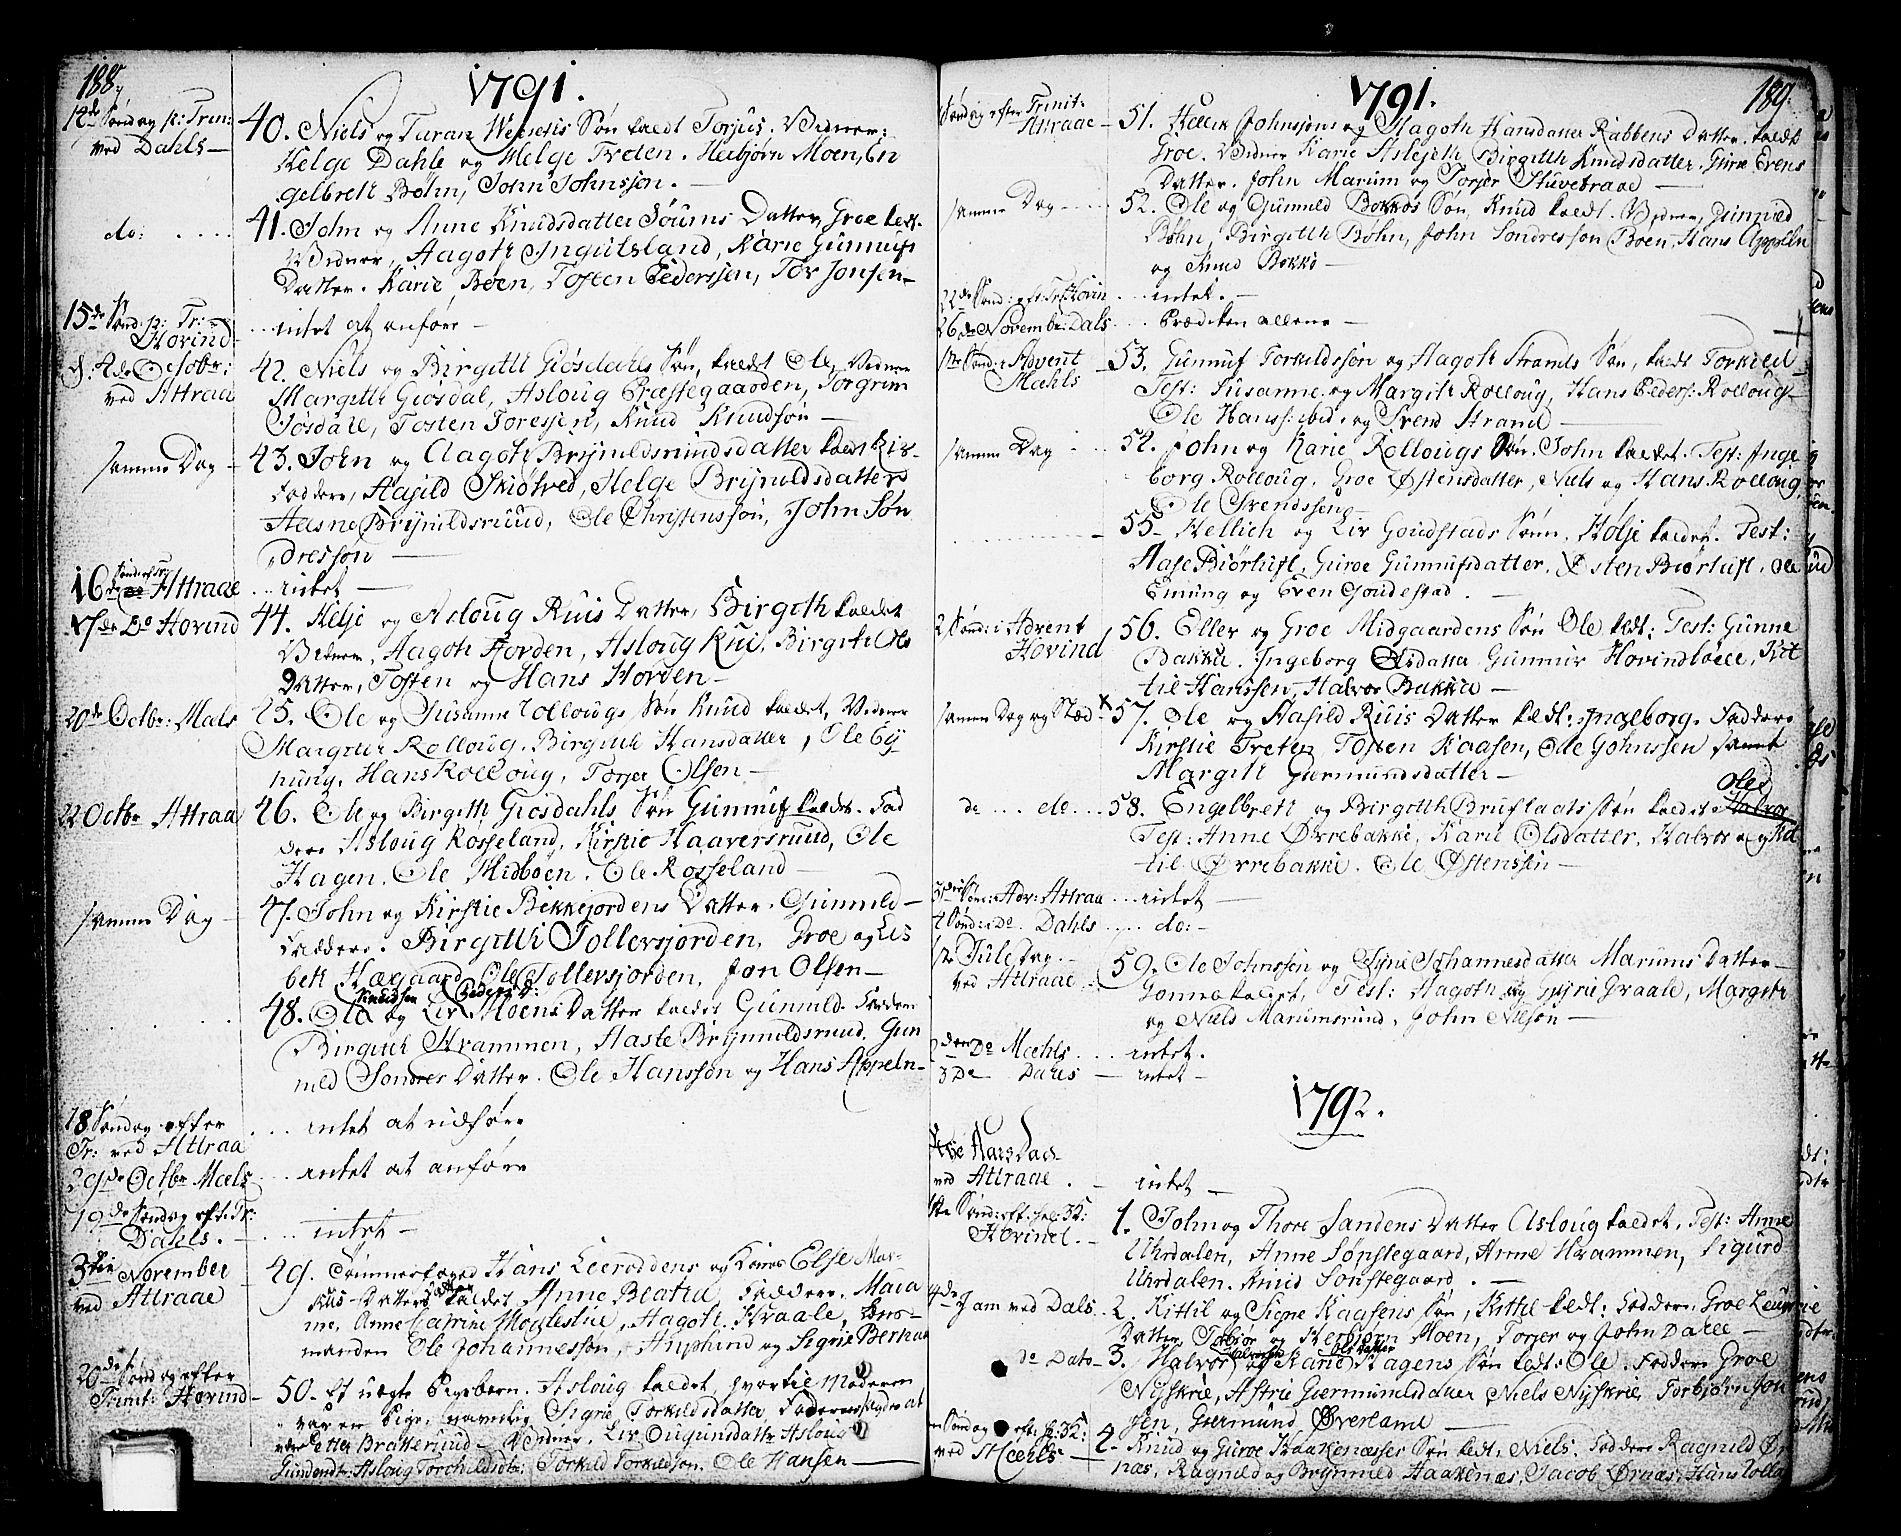 SAKO, Tinn kirkebøker, F/Fa/L0002: Ministerialbok nr. I 2, 1757-1810, s. 188-189